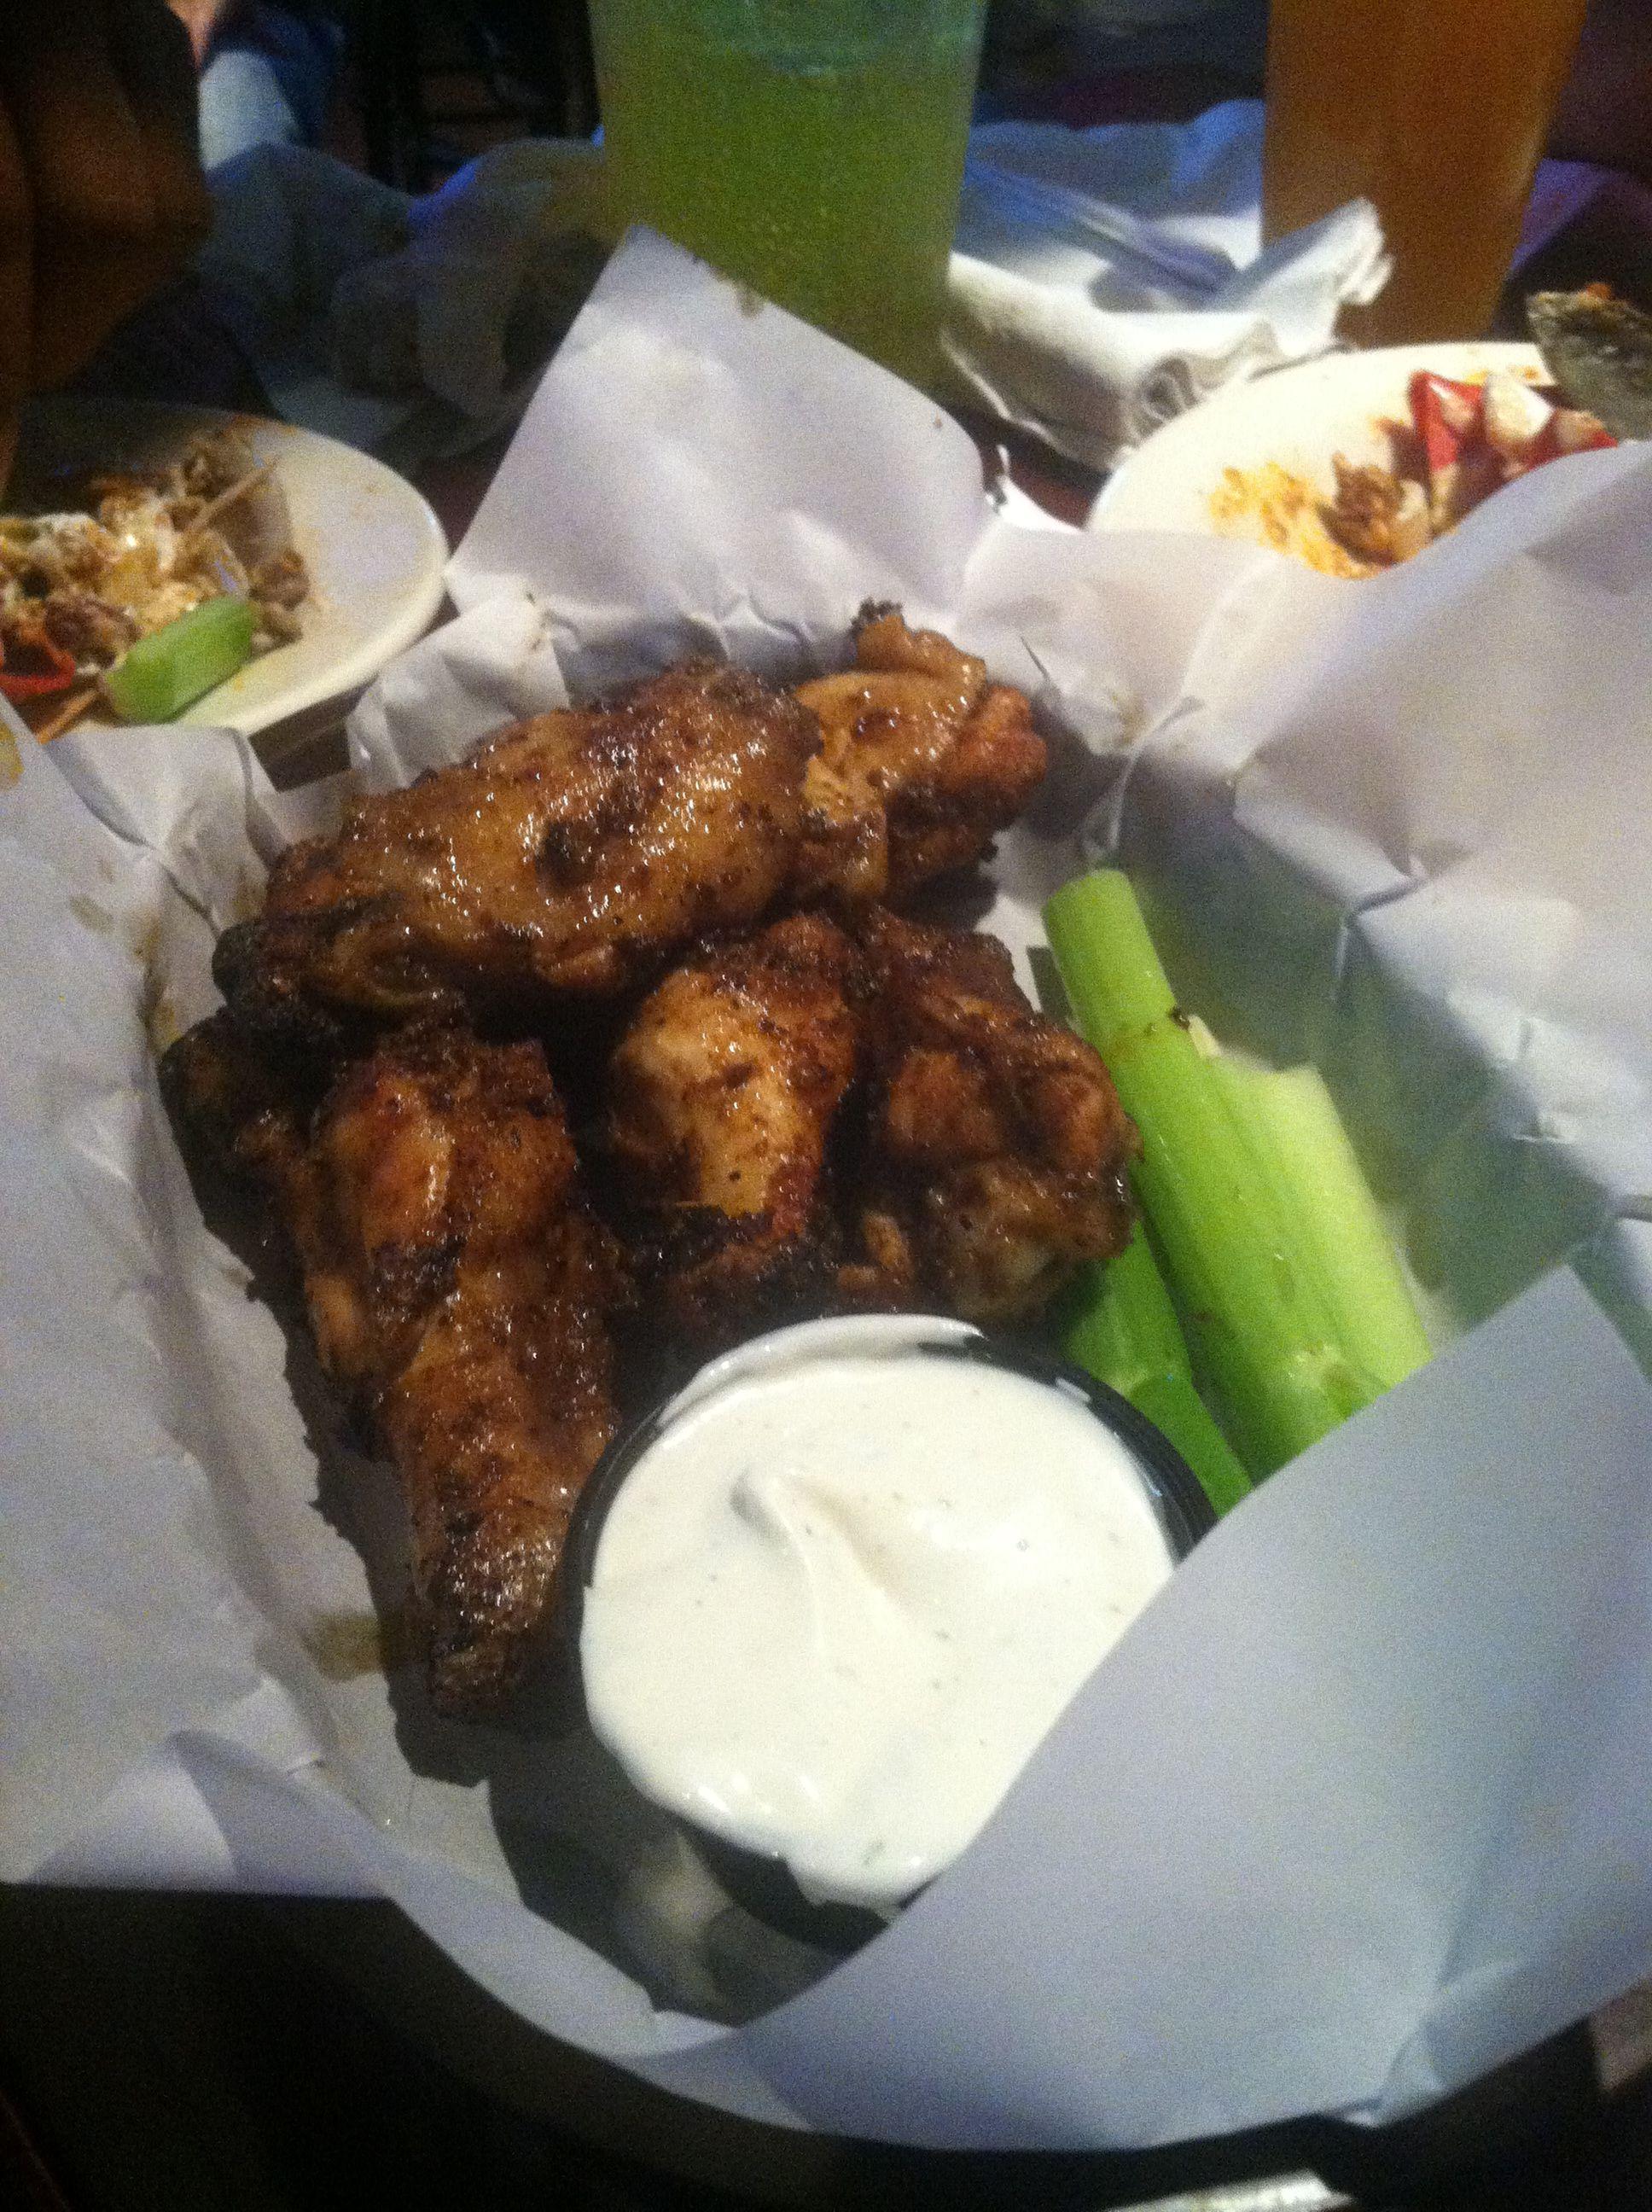 Dry Rub Wings From My Favorite Sports Bar Kickback Jack S In Greensboro Nc Dry Rub Recipes Cooking Recipes Rub Recipes